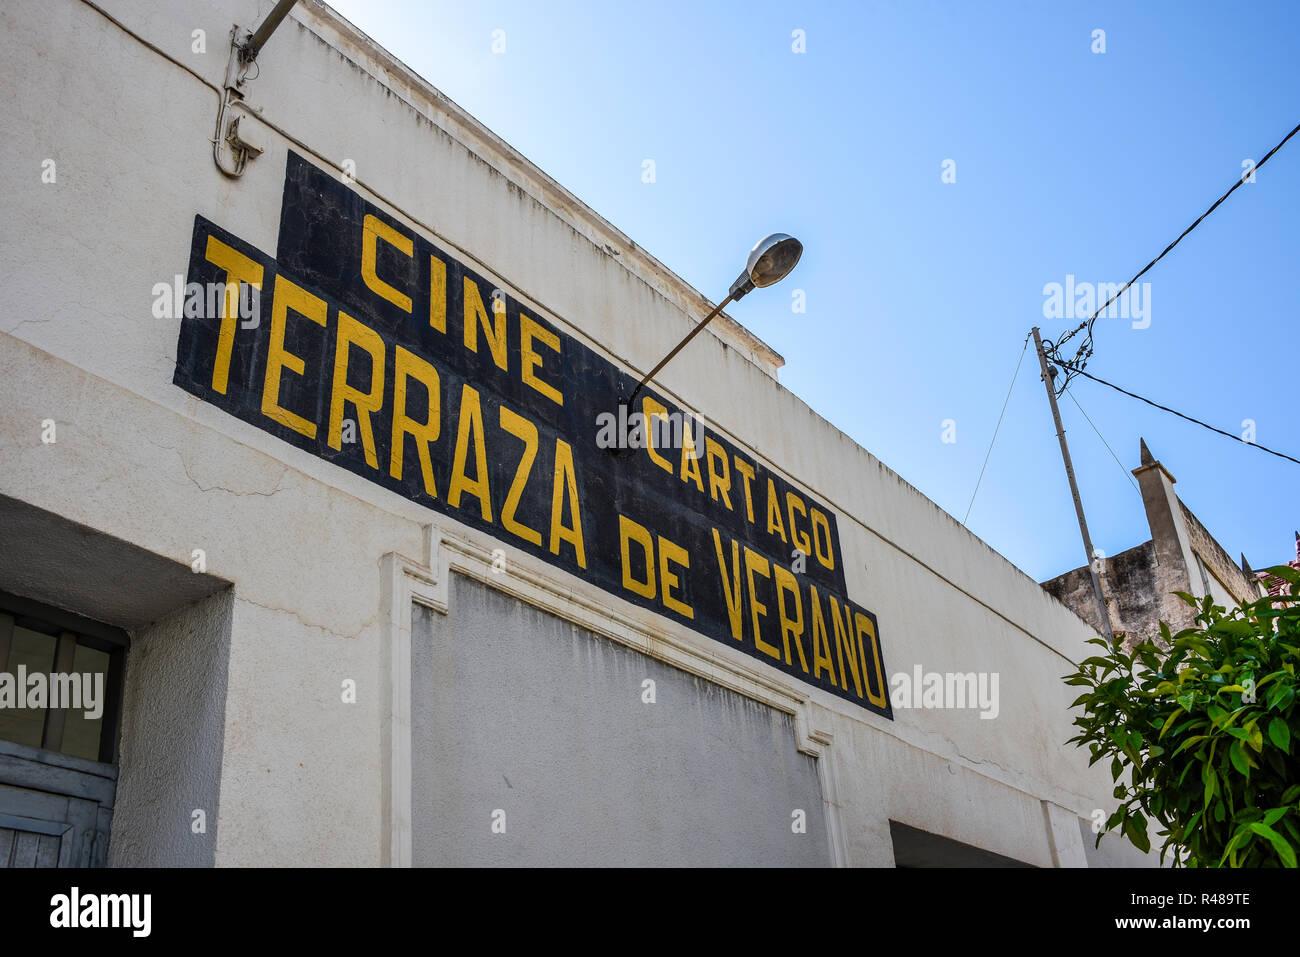 Old Cartago Cine Terraza De Verano Cinema Pictures Picture